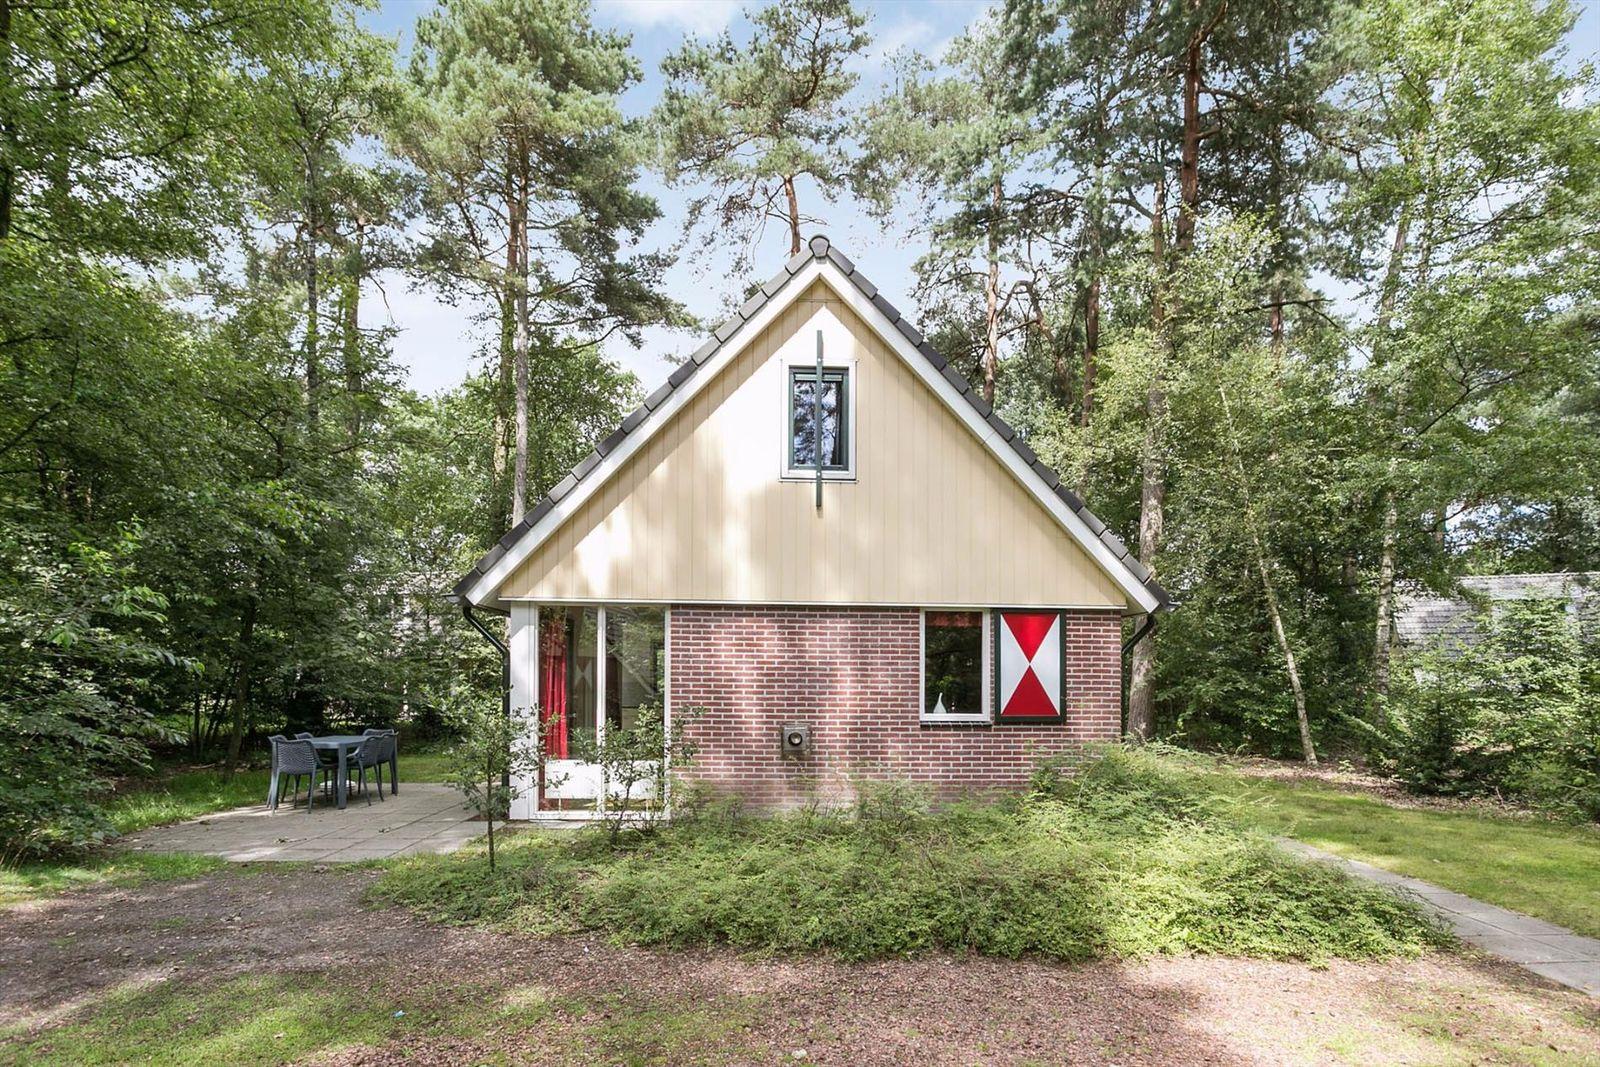 Bospark Lunsbergen type Zuiderveld 285, Borger